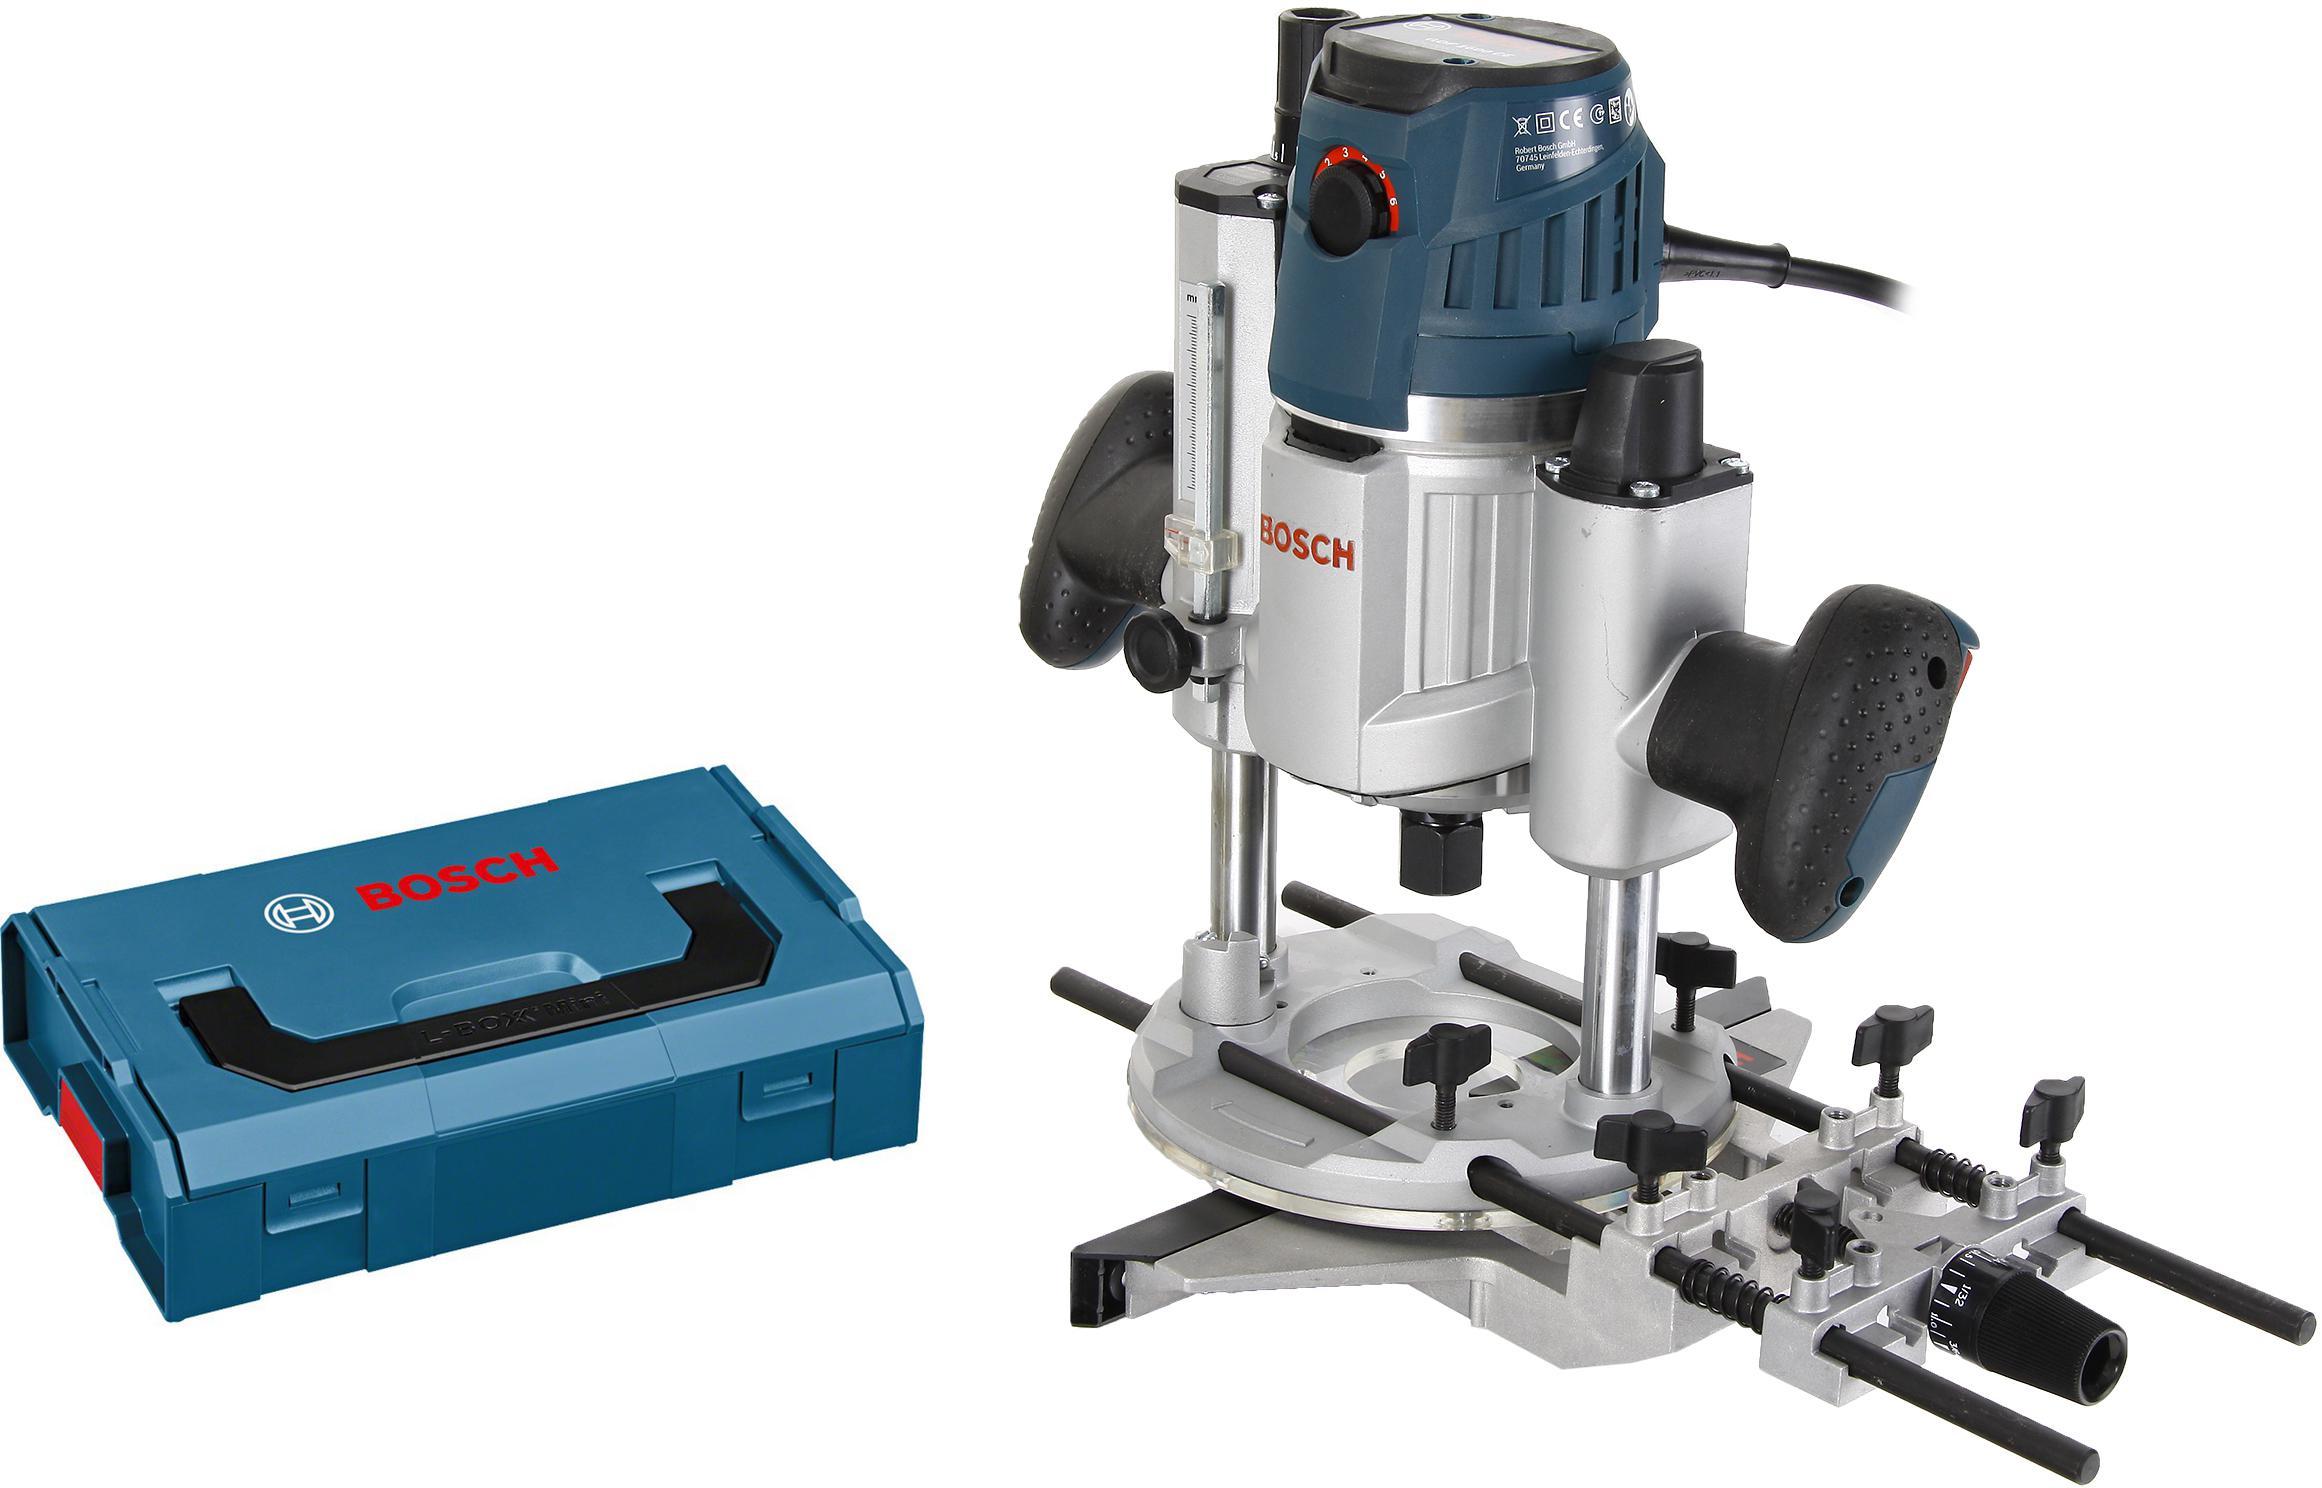 цена на Набор Bosch Фрезер gmf 1600 ce l-boxx (0.601.624.002) +Ящик l-boxx mini (1.600.a00.7sf)